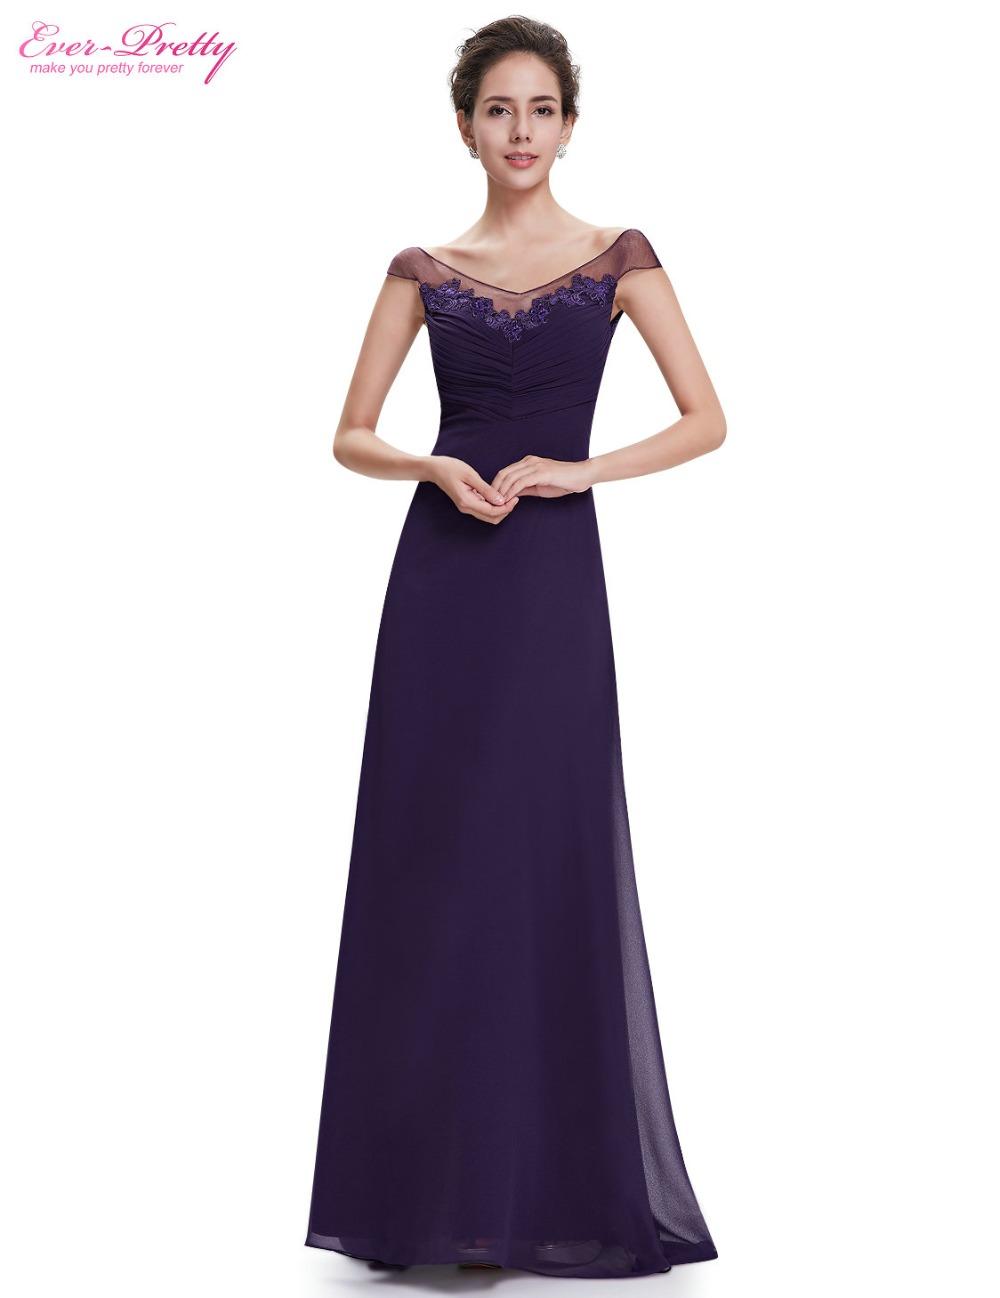 Ever Pretty Women's Evening Dresses HE08684PP Women's ...